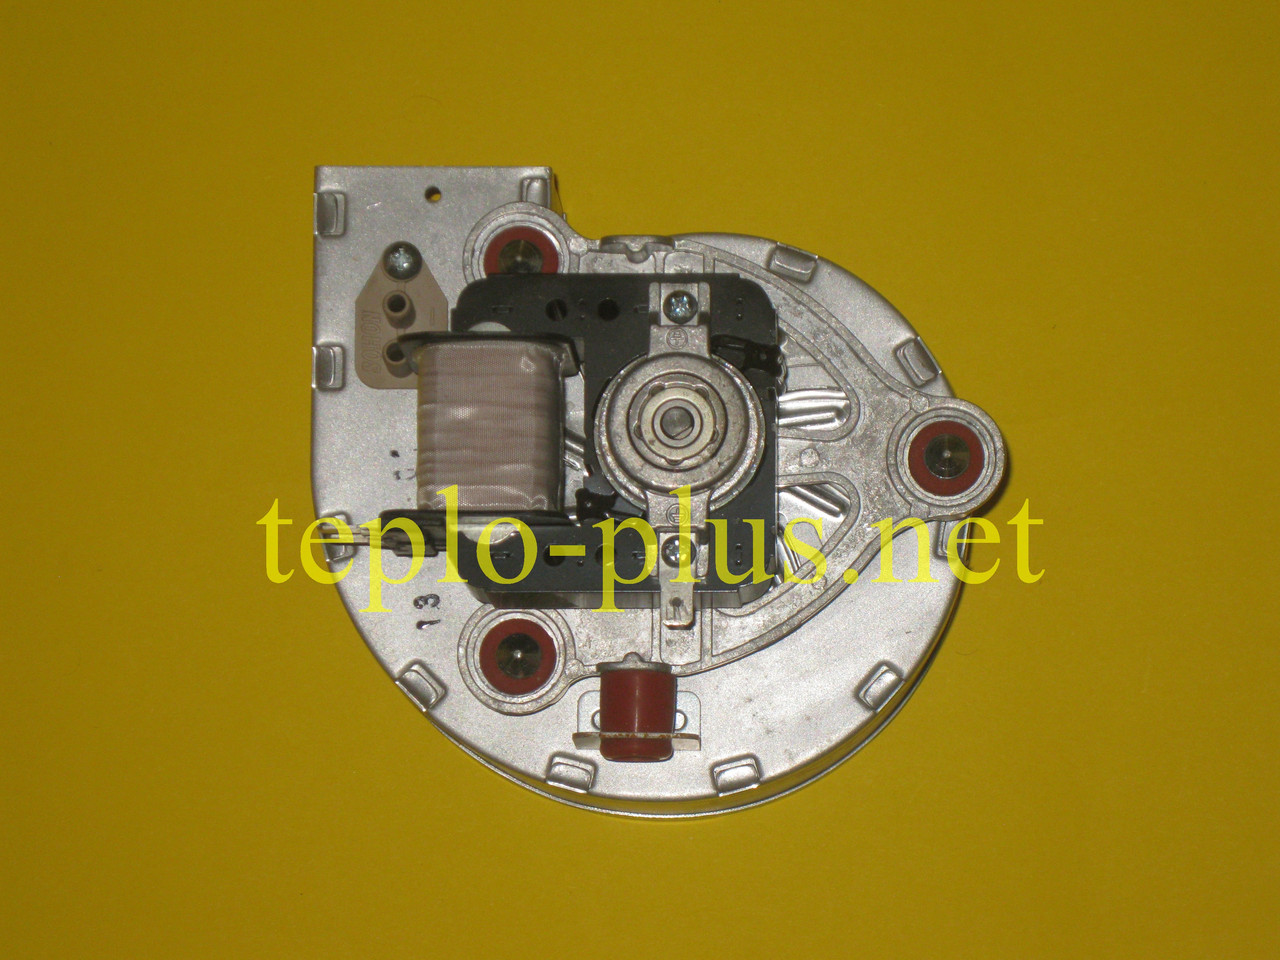 Вентилятор Rocterm Emerald TE-B17, TE-B24, TE-B27, Ruby TR-B20, R-B24, Praga